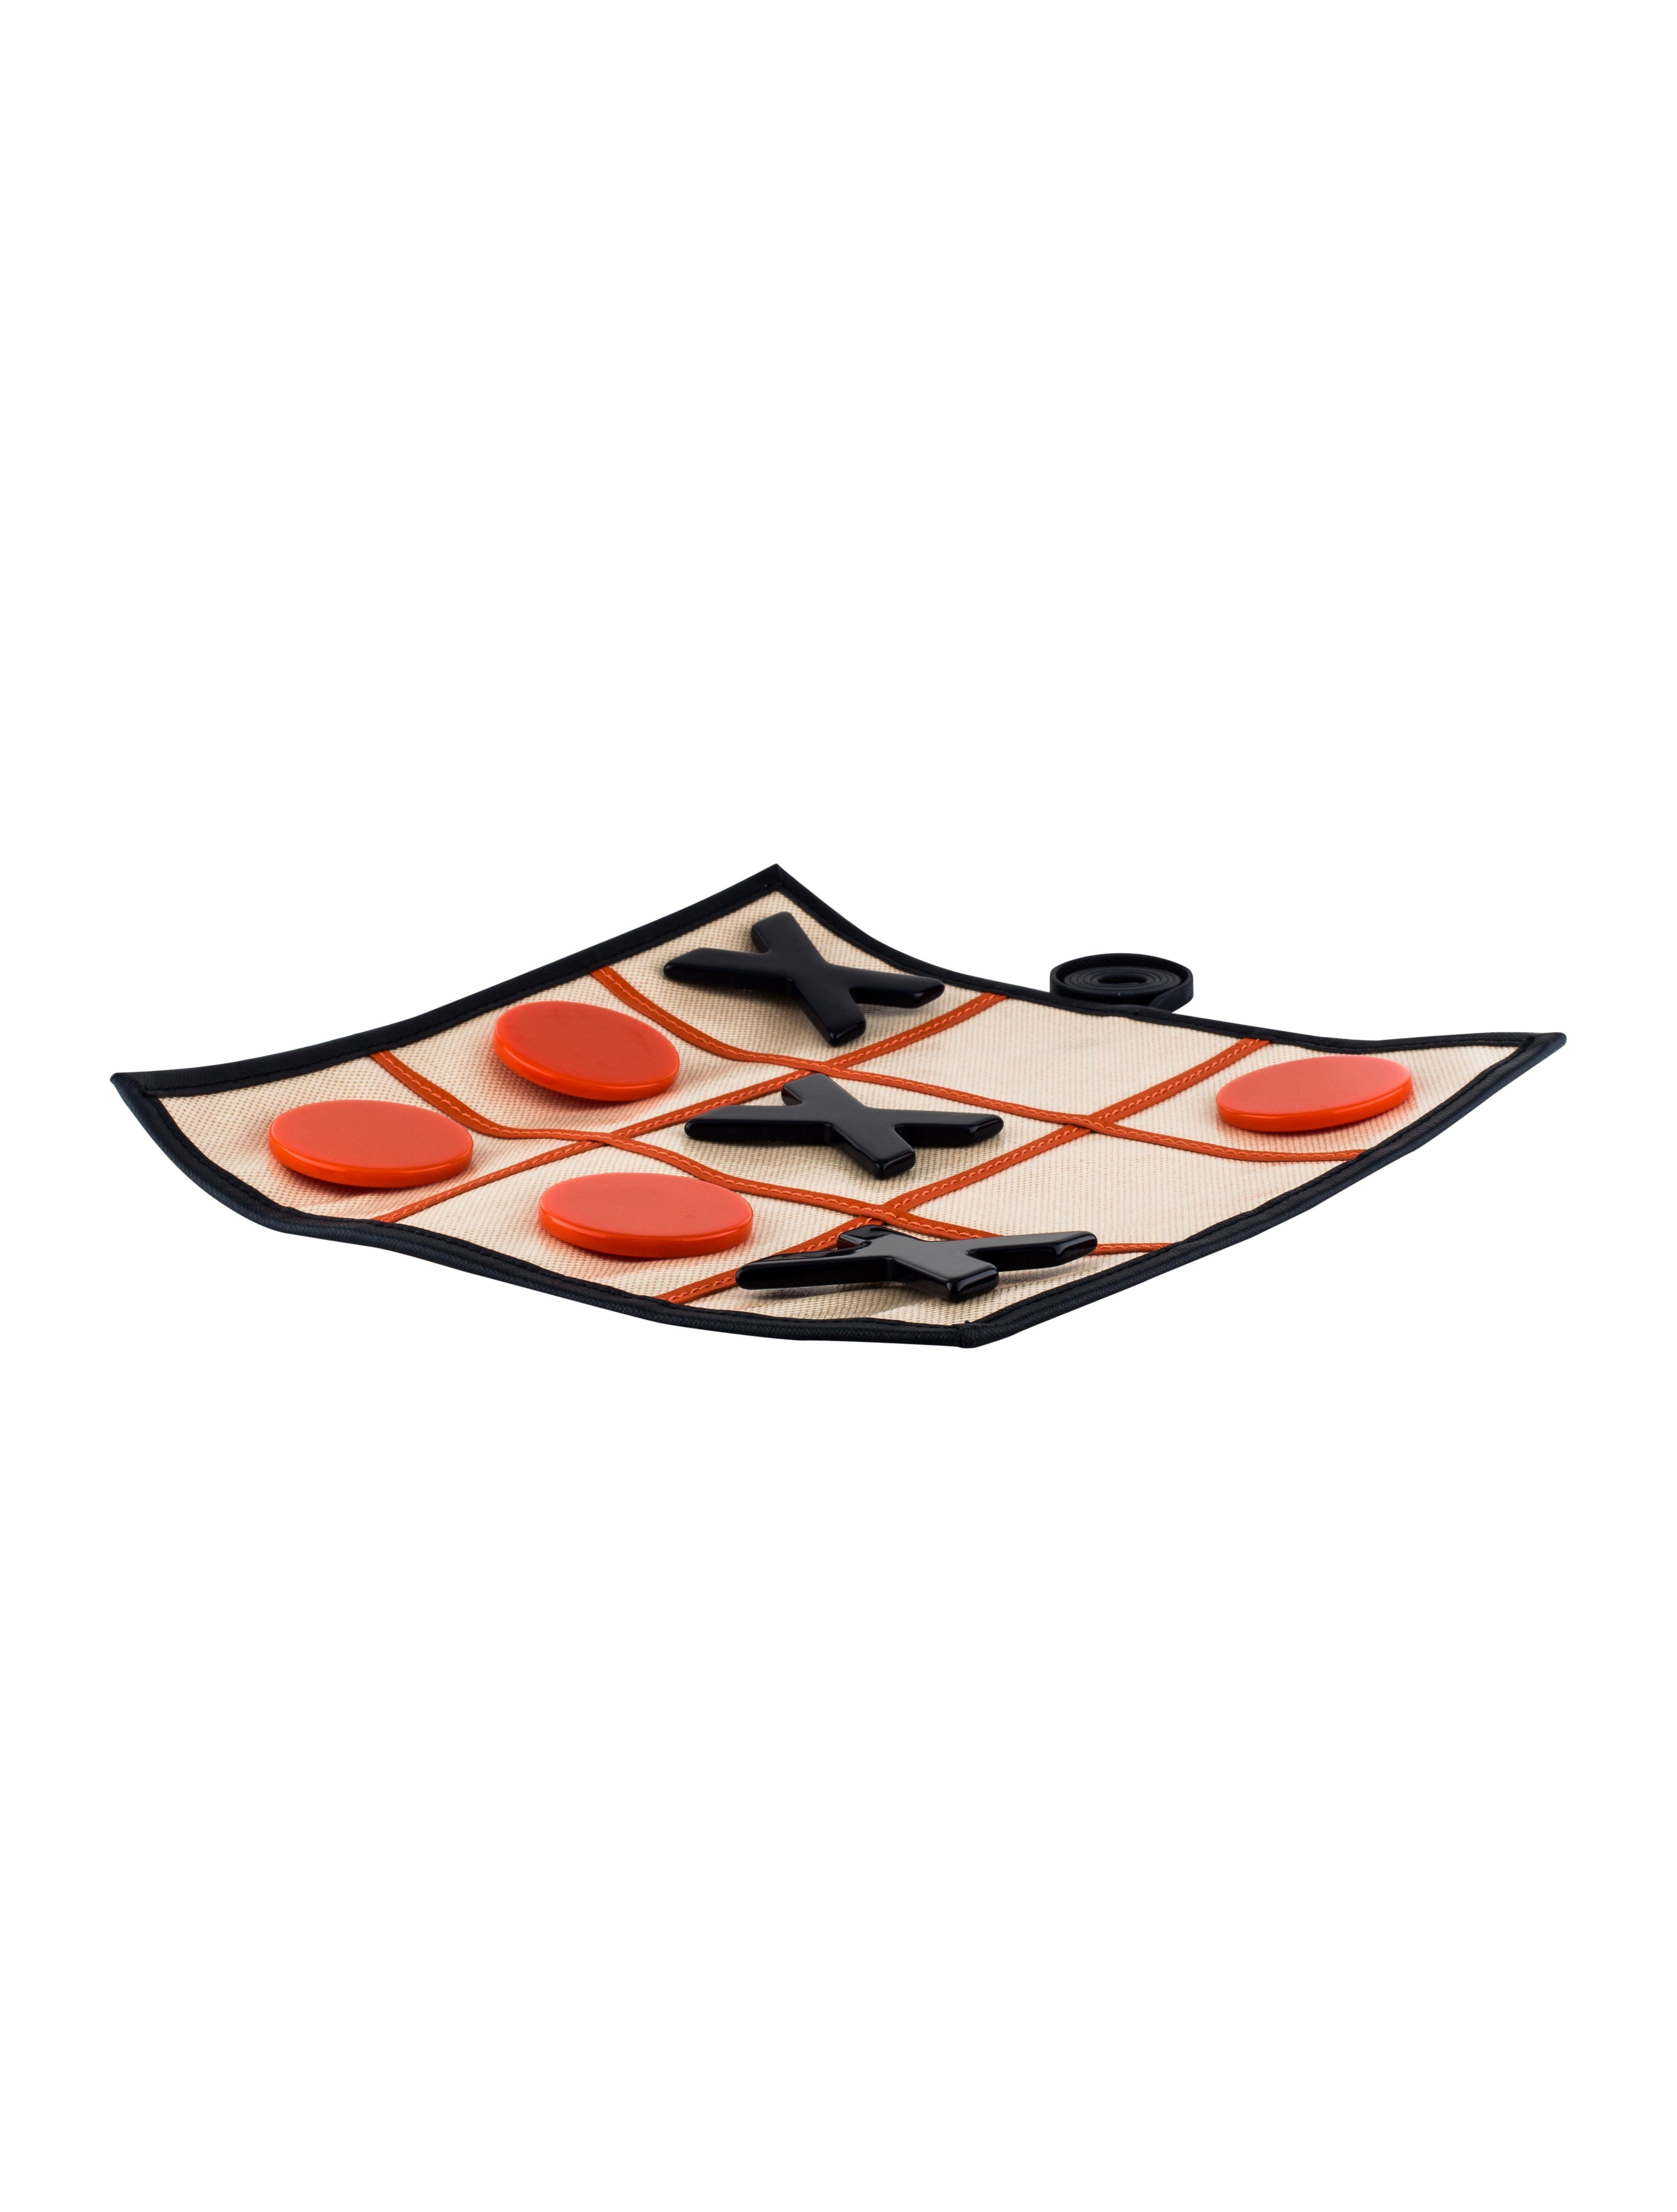 2-Piece Backgammon & Tic-Tac-Toe Game Set w/ Tags | Like